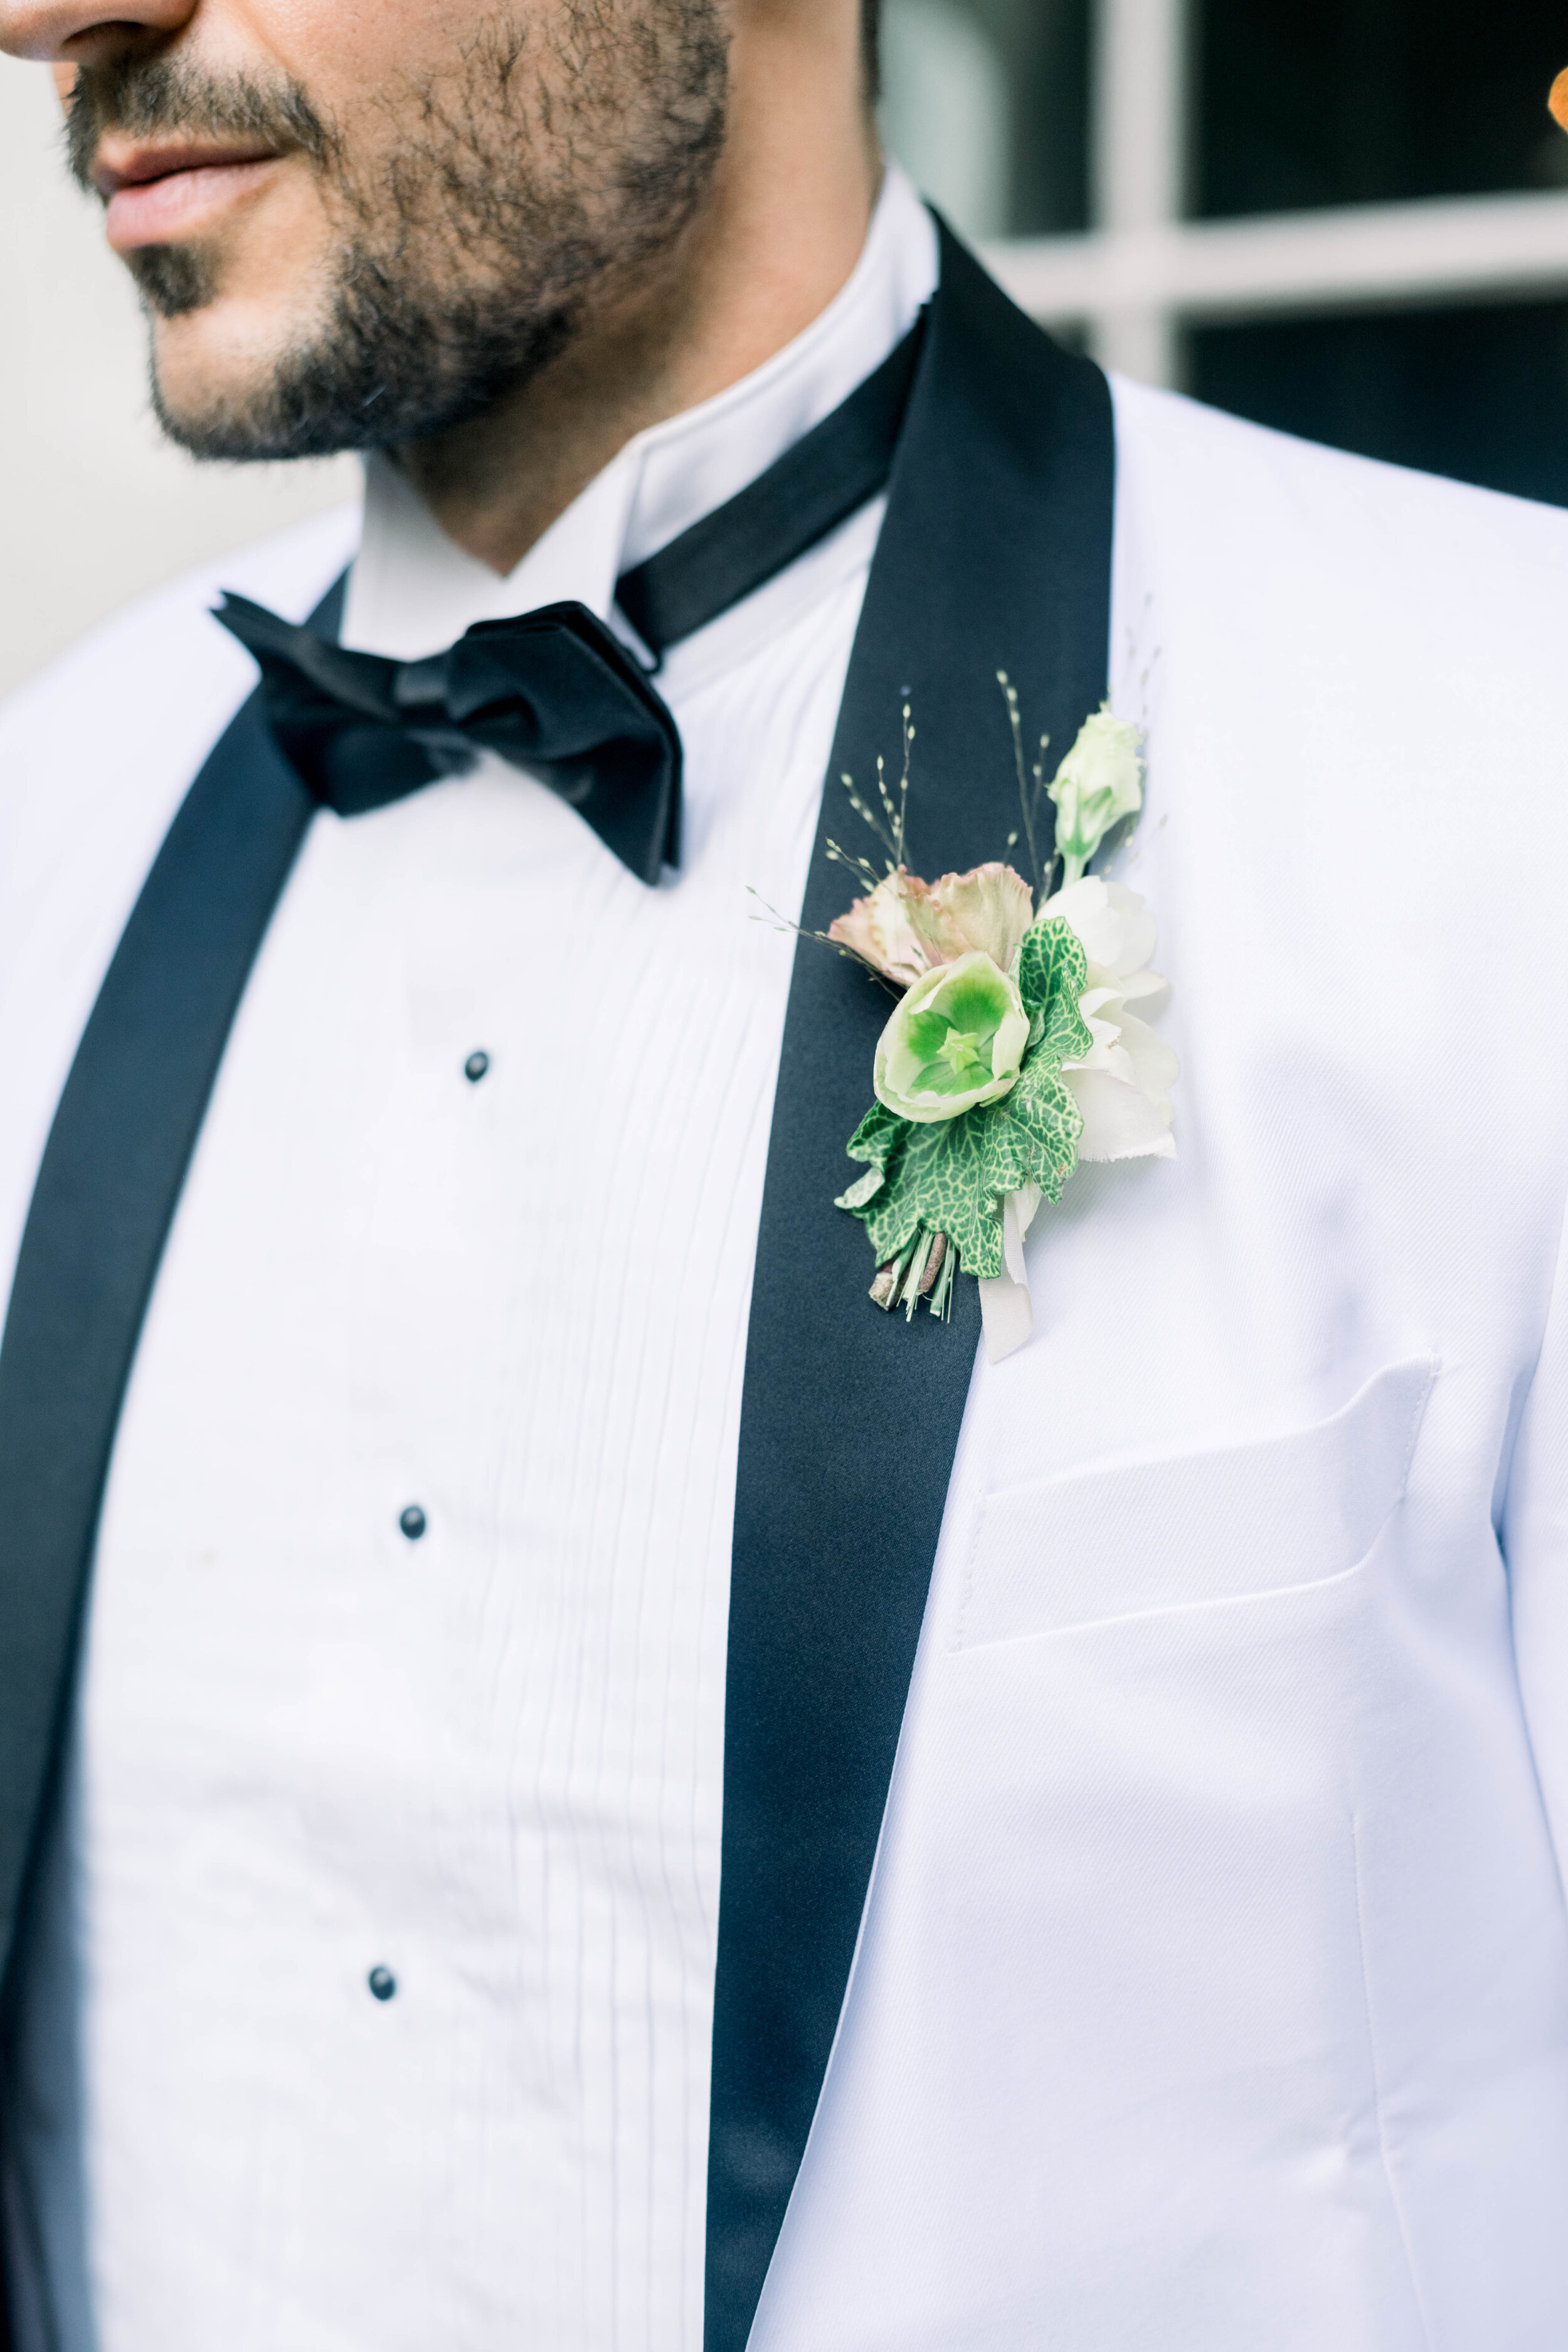 fine art wedding, Atlanta wedding, swan house wedding, modern wedding, rolls Royce wedding, swan house, high neck wedding dress, white tux, boutonnière